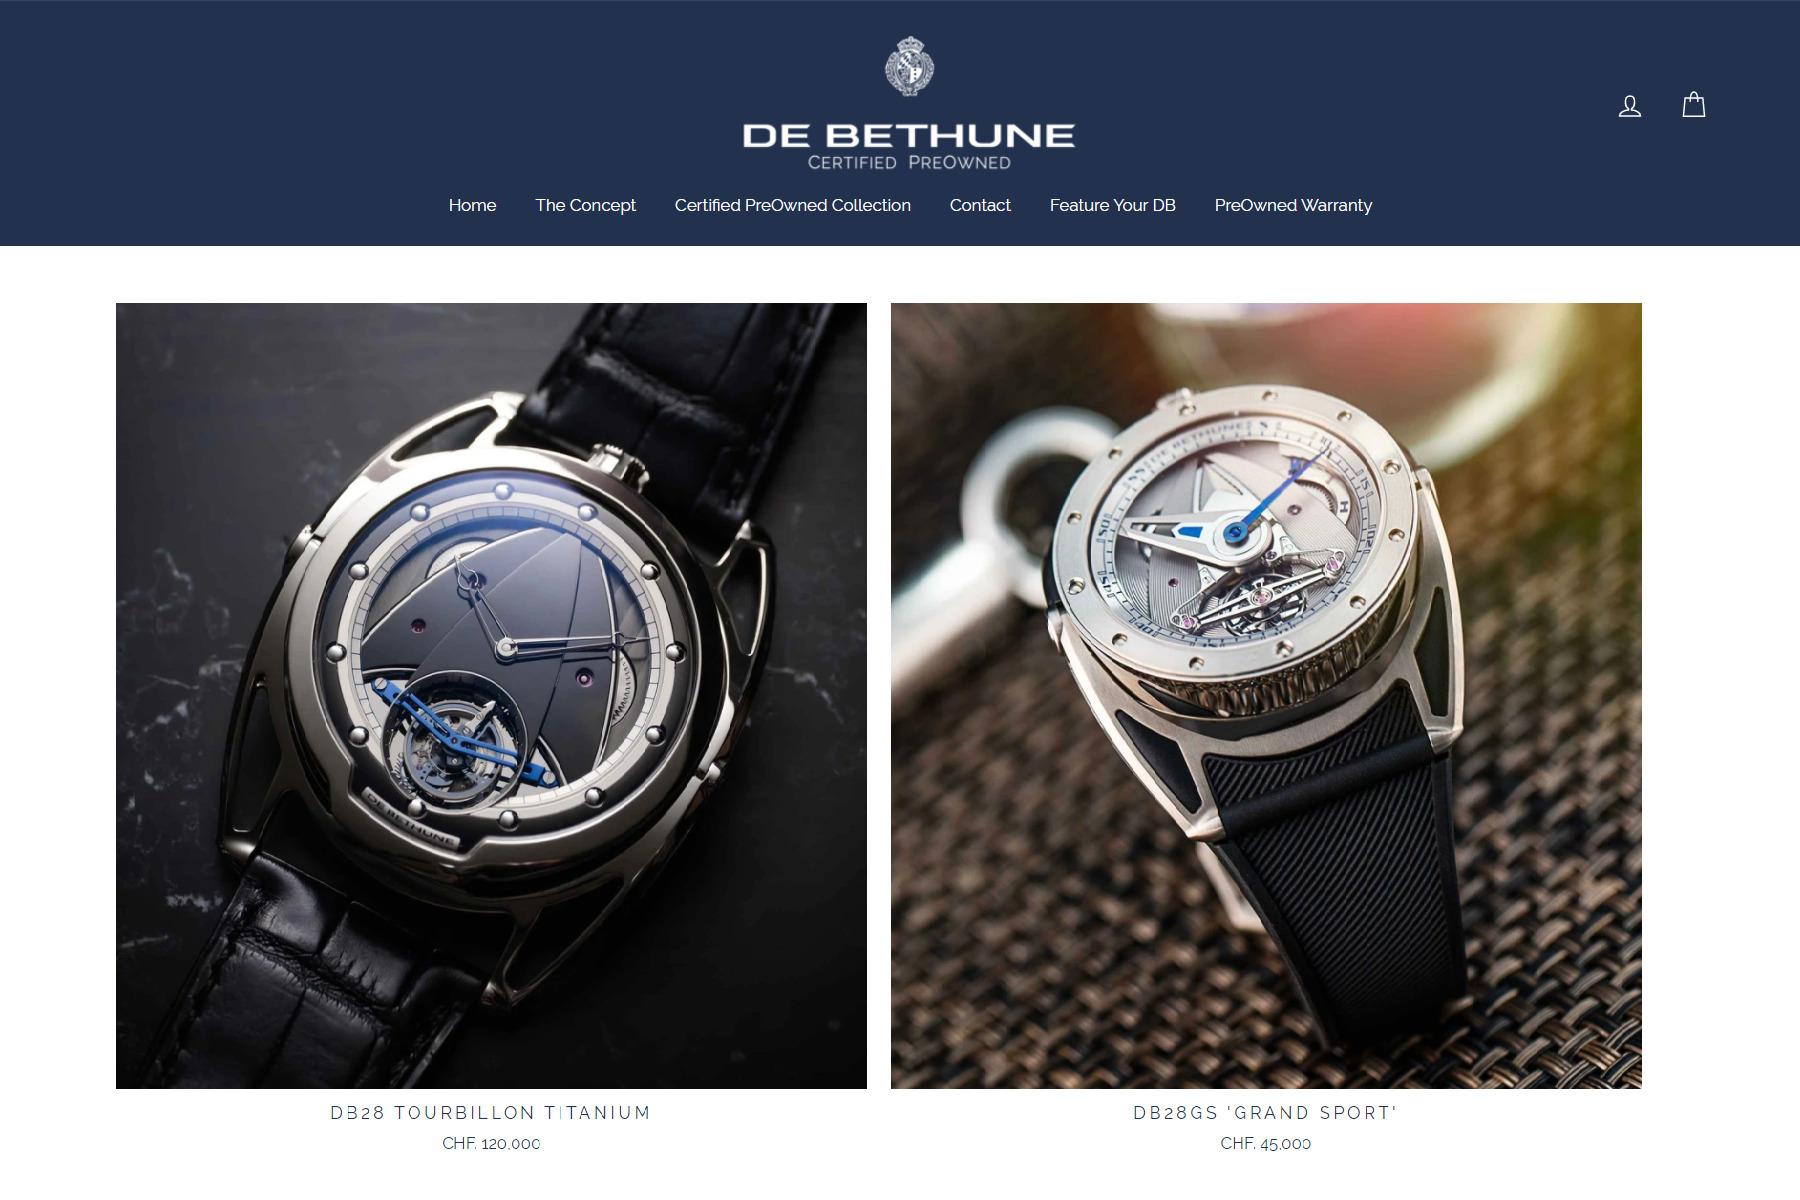 Debthune Pre-Owned second hand luxury